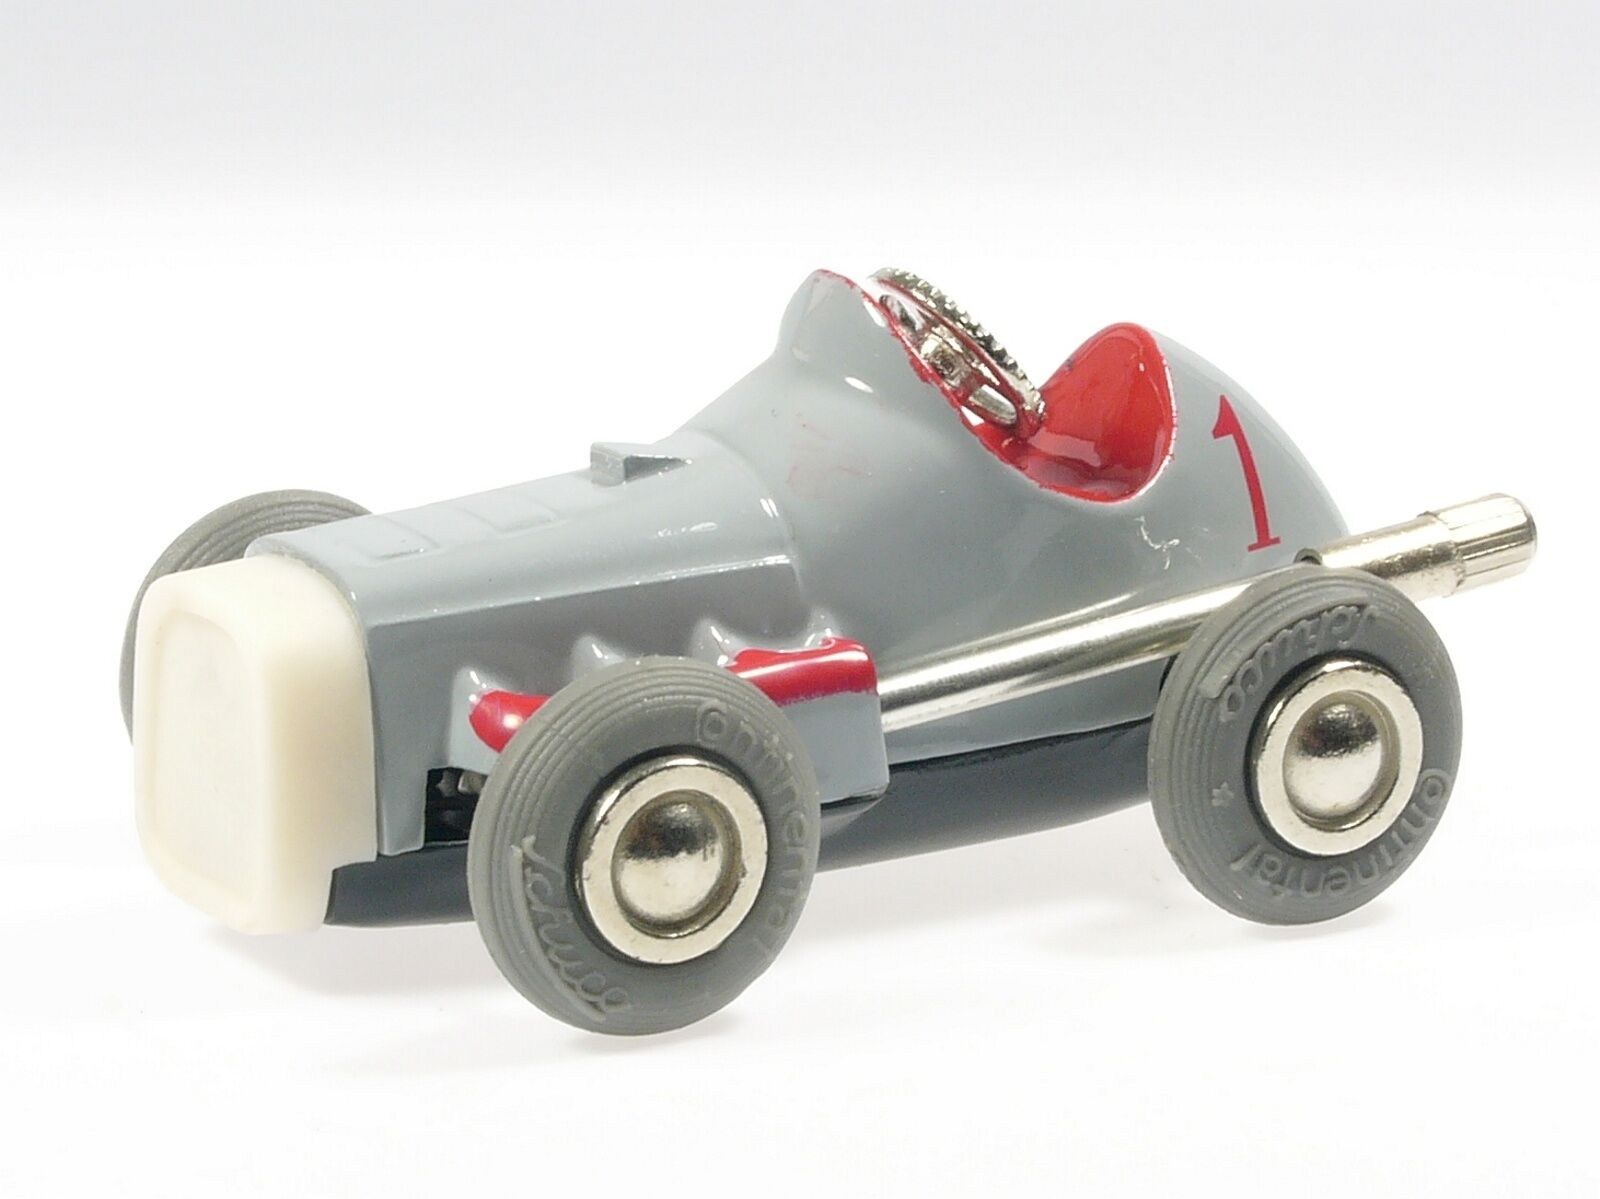 Schuco Micro-Racer Midget grau grau grau 1041   170    Einzigartig  02c7bc